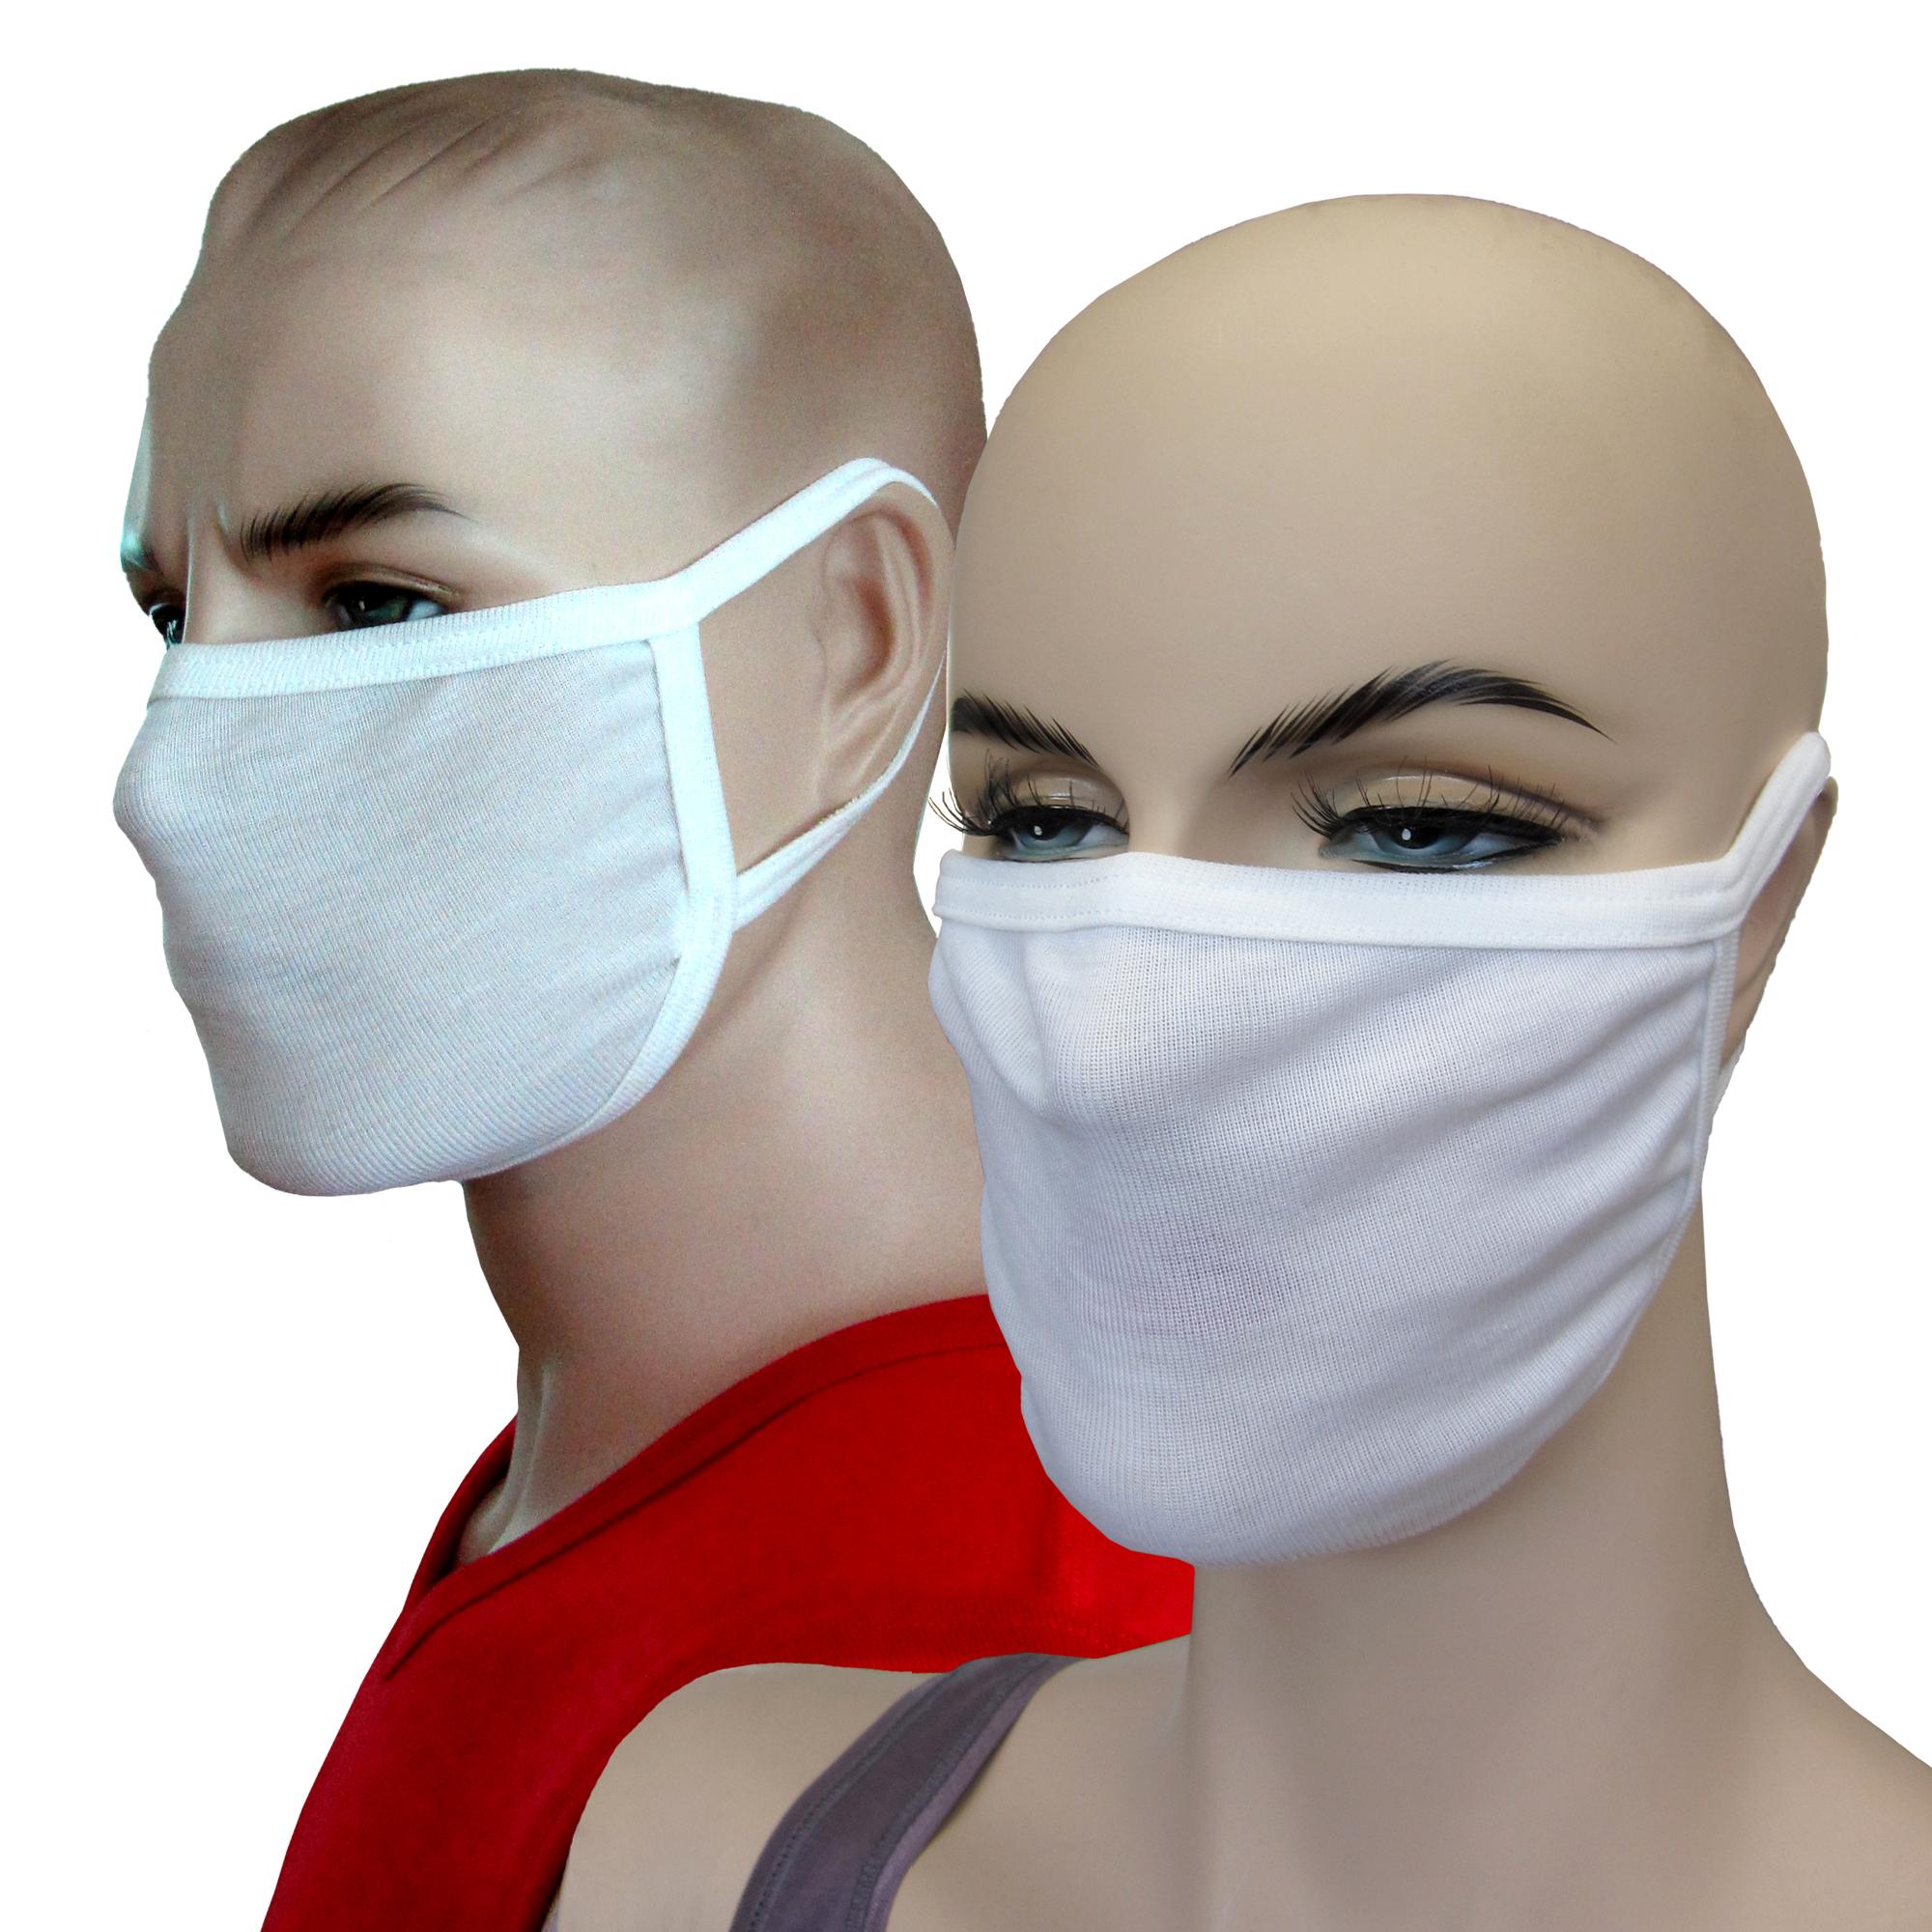 Corona Schutzmasken Kaufen